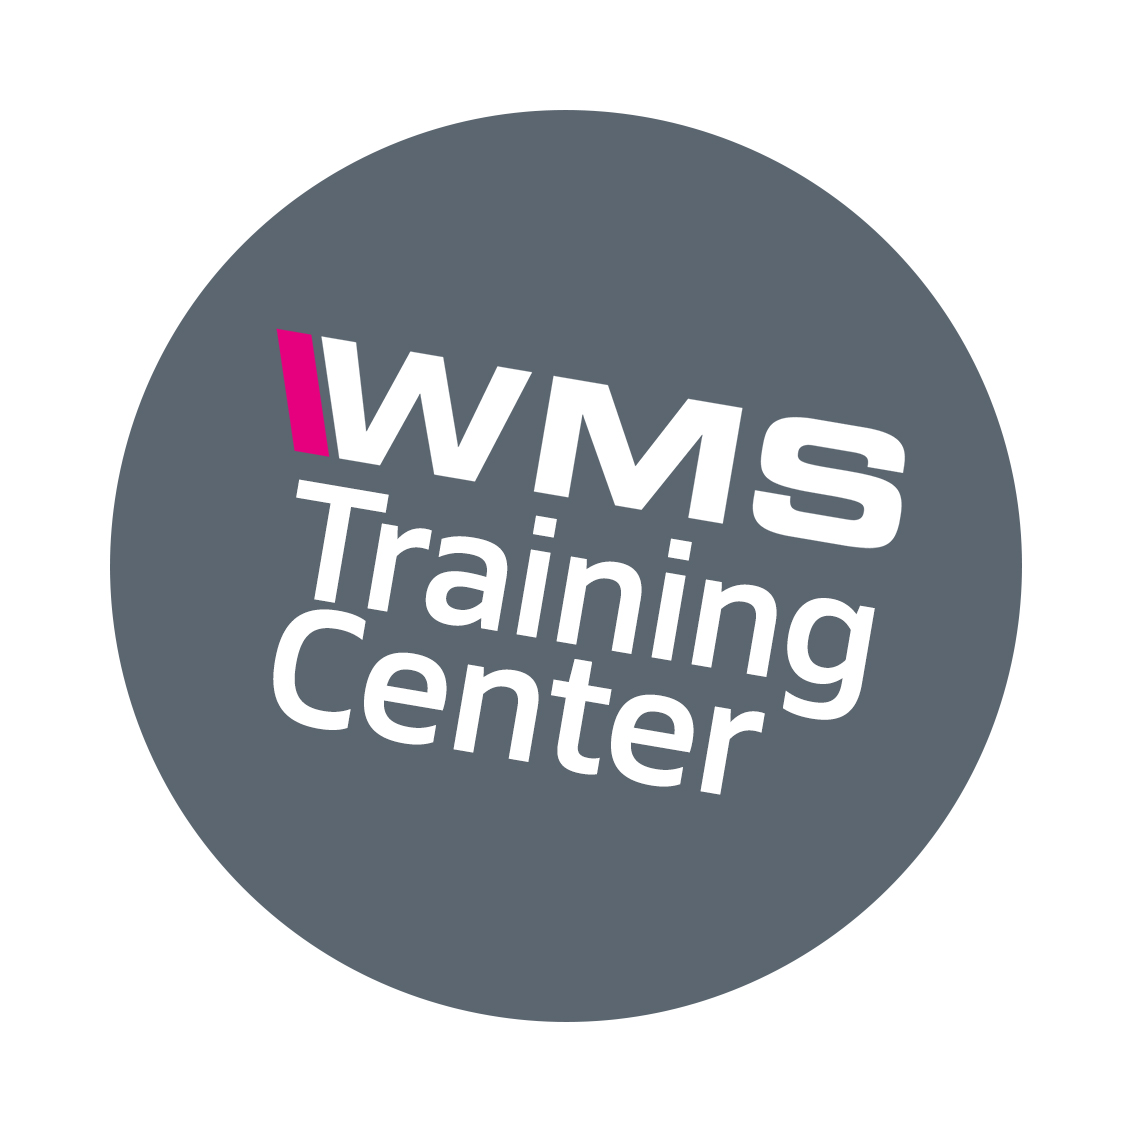 WMS Training Center